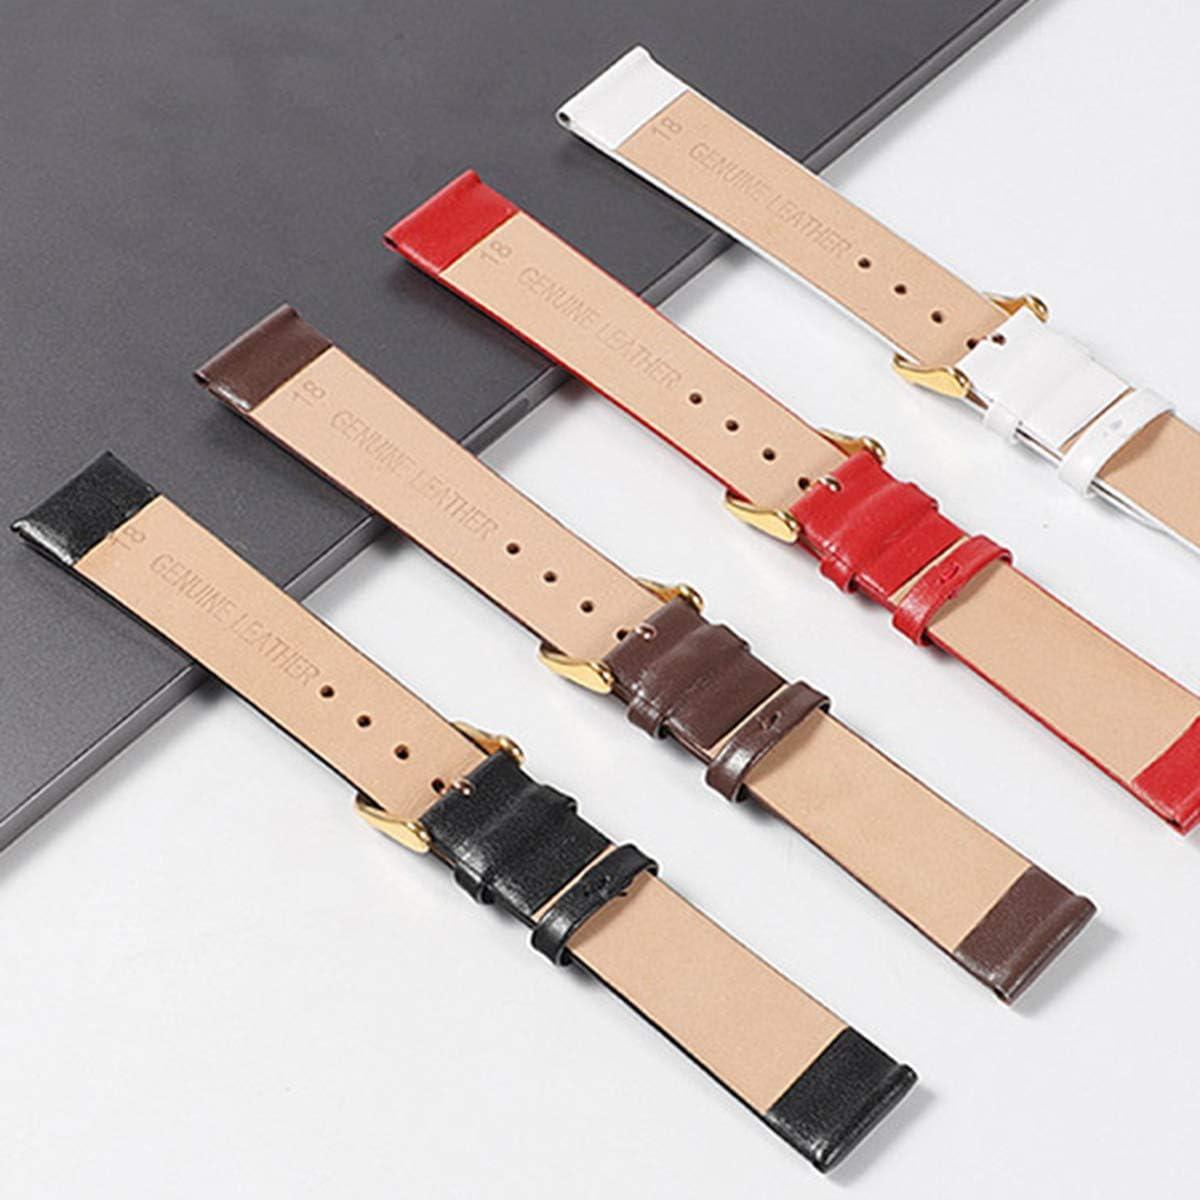 Uhren Zubehör 12mm-24mm-echtes Leder-Uhrenarmband Uhrenarmband Mode Uhrenarmbänder P05 3 (3)